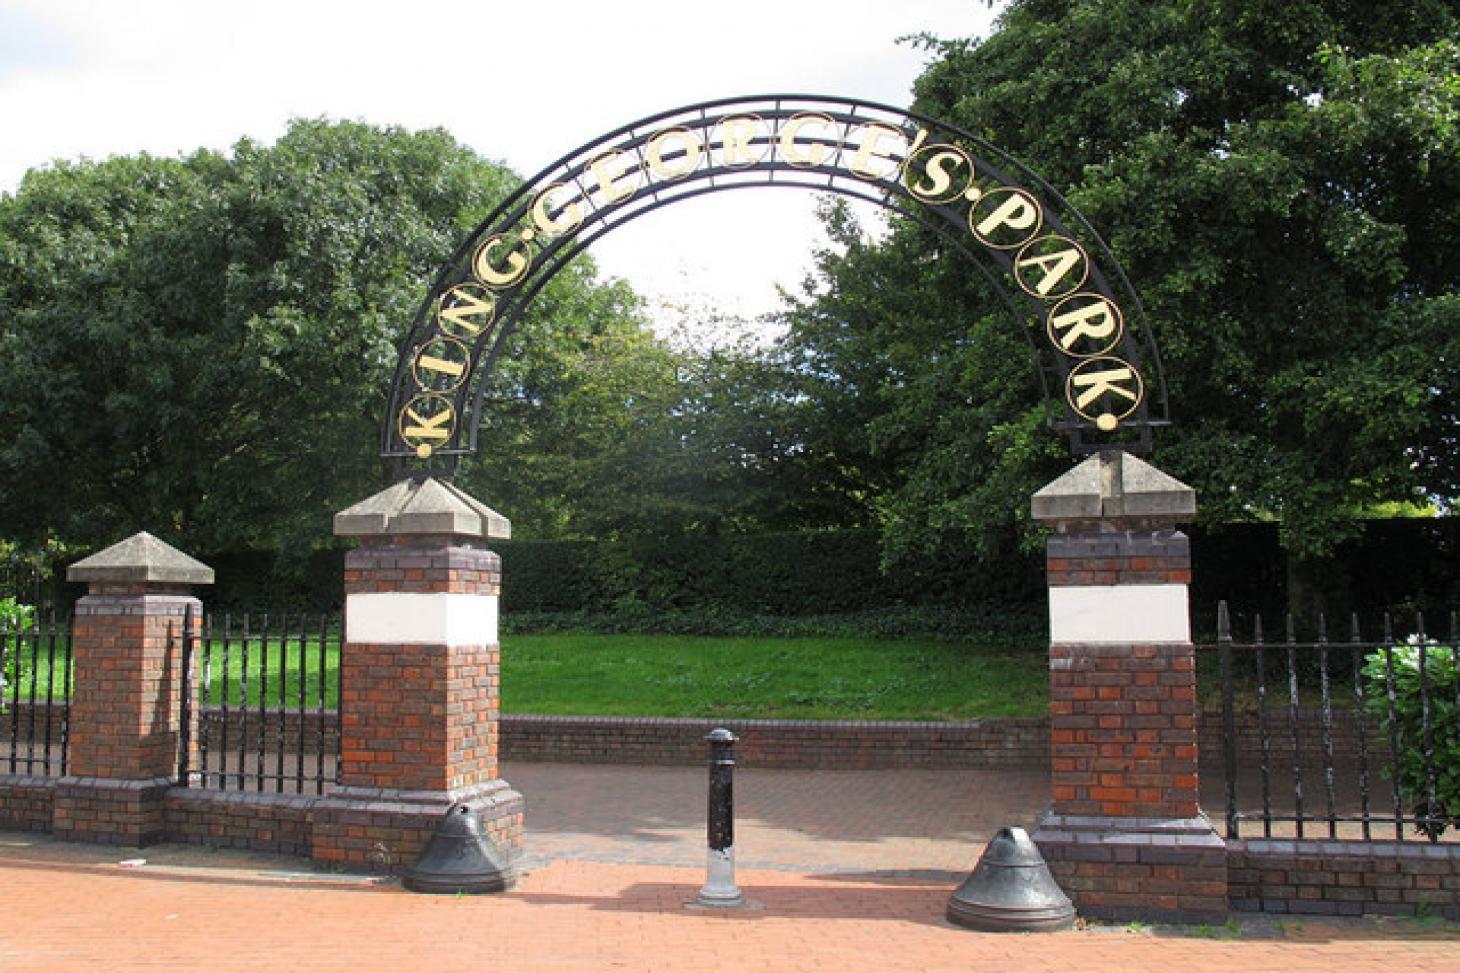 King George's Park Outdoor | Hard (macadam) tennis court